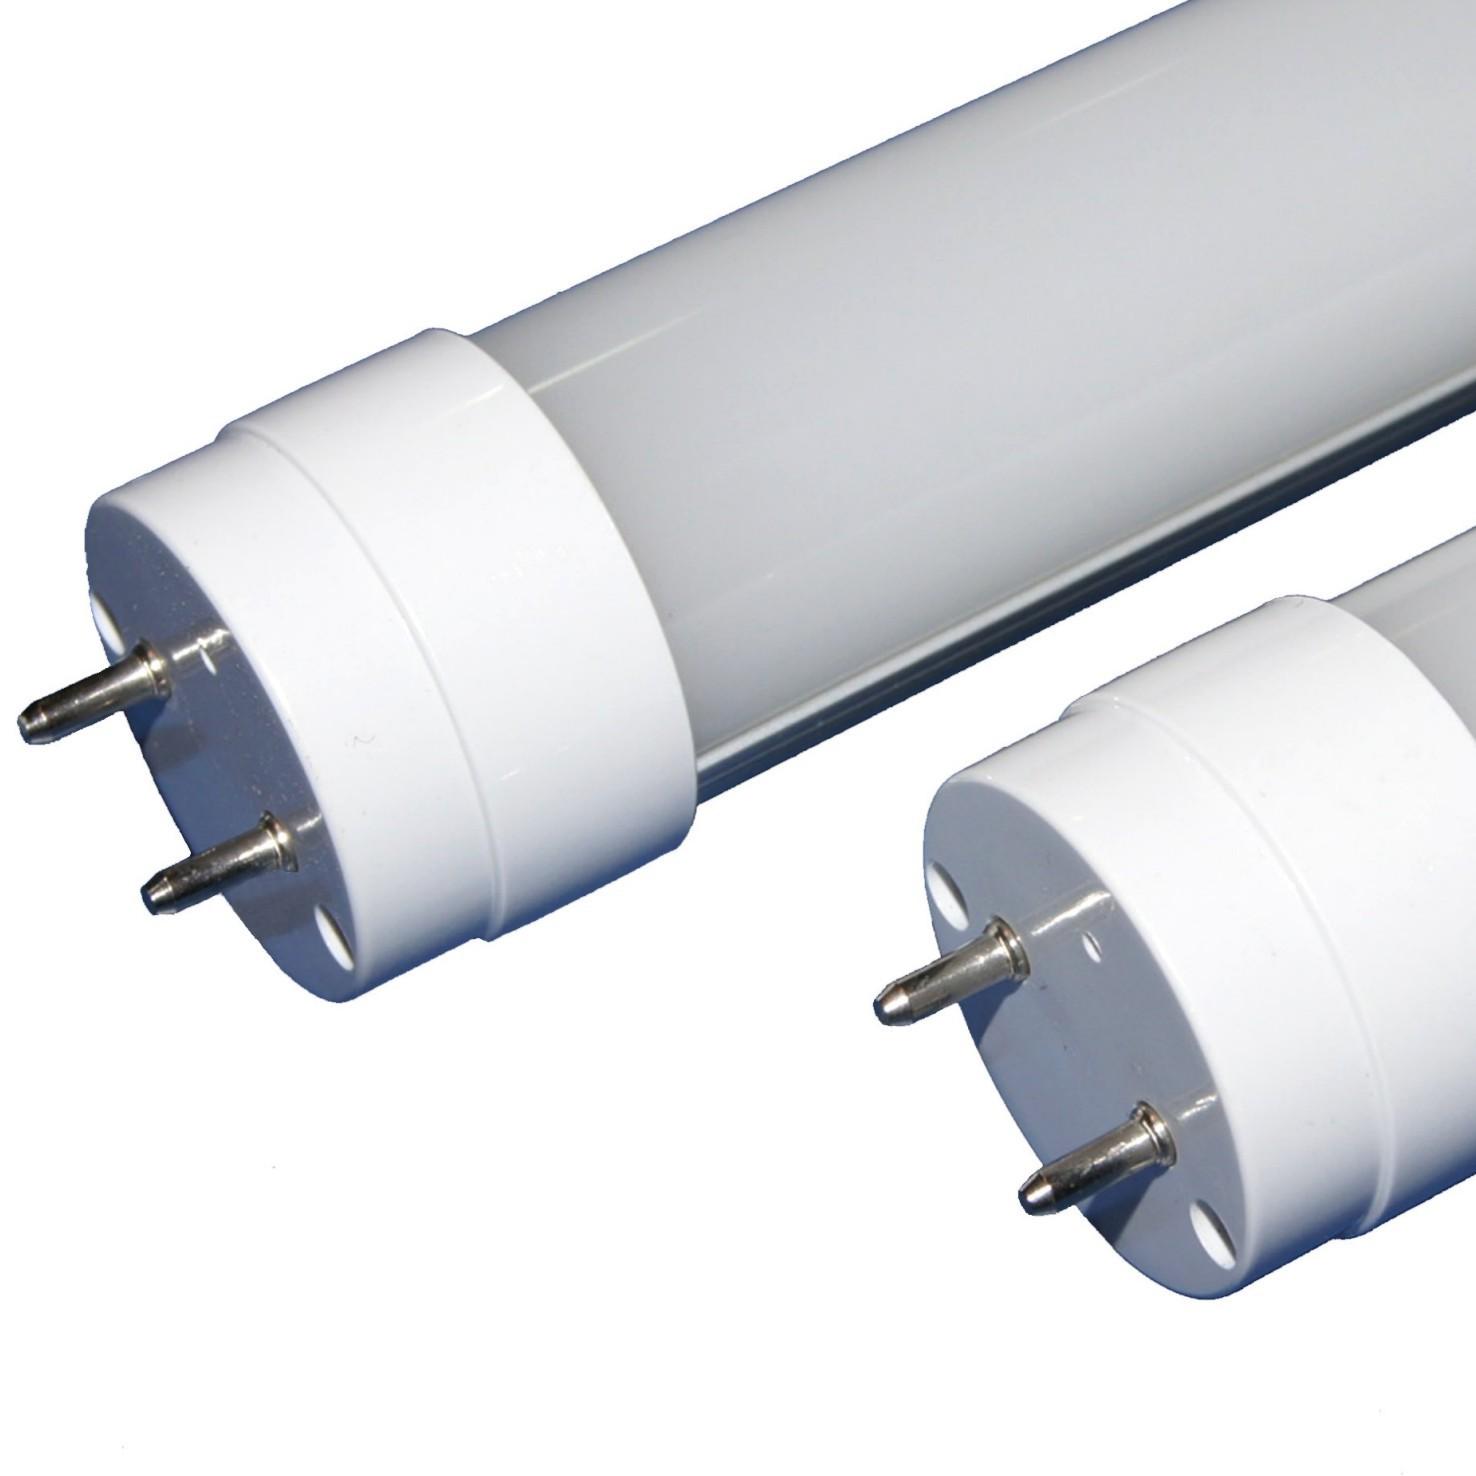 Tubos led t8 y t5 aluminio y policarbonato agraled - Fluorescente led precio ...